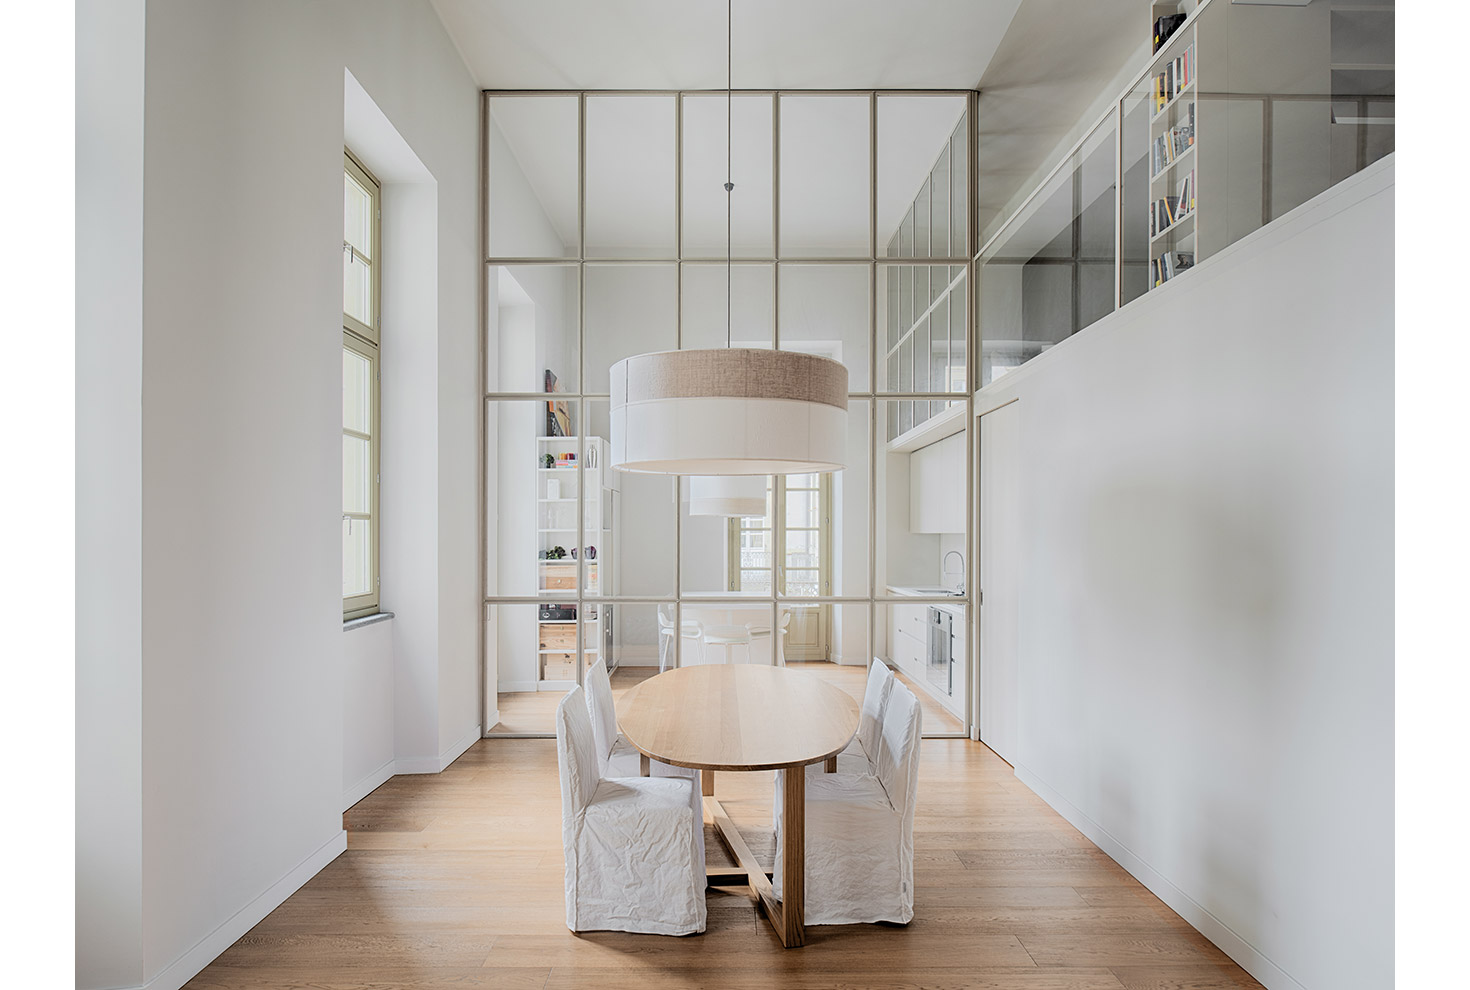 marco-tacchini-fotografo-architettura-torino-maat-architettura_02